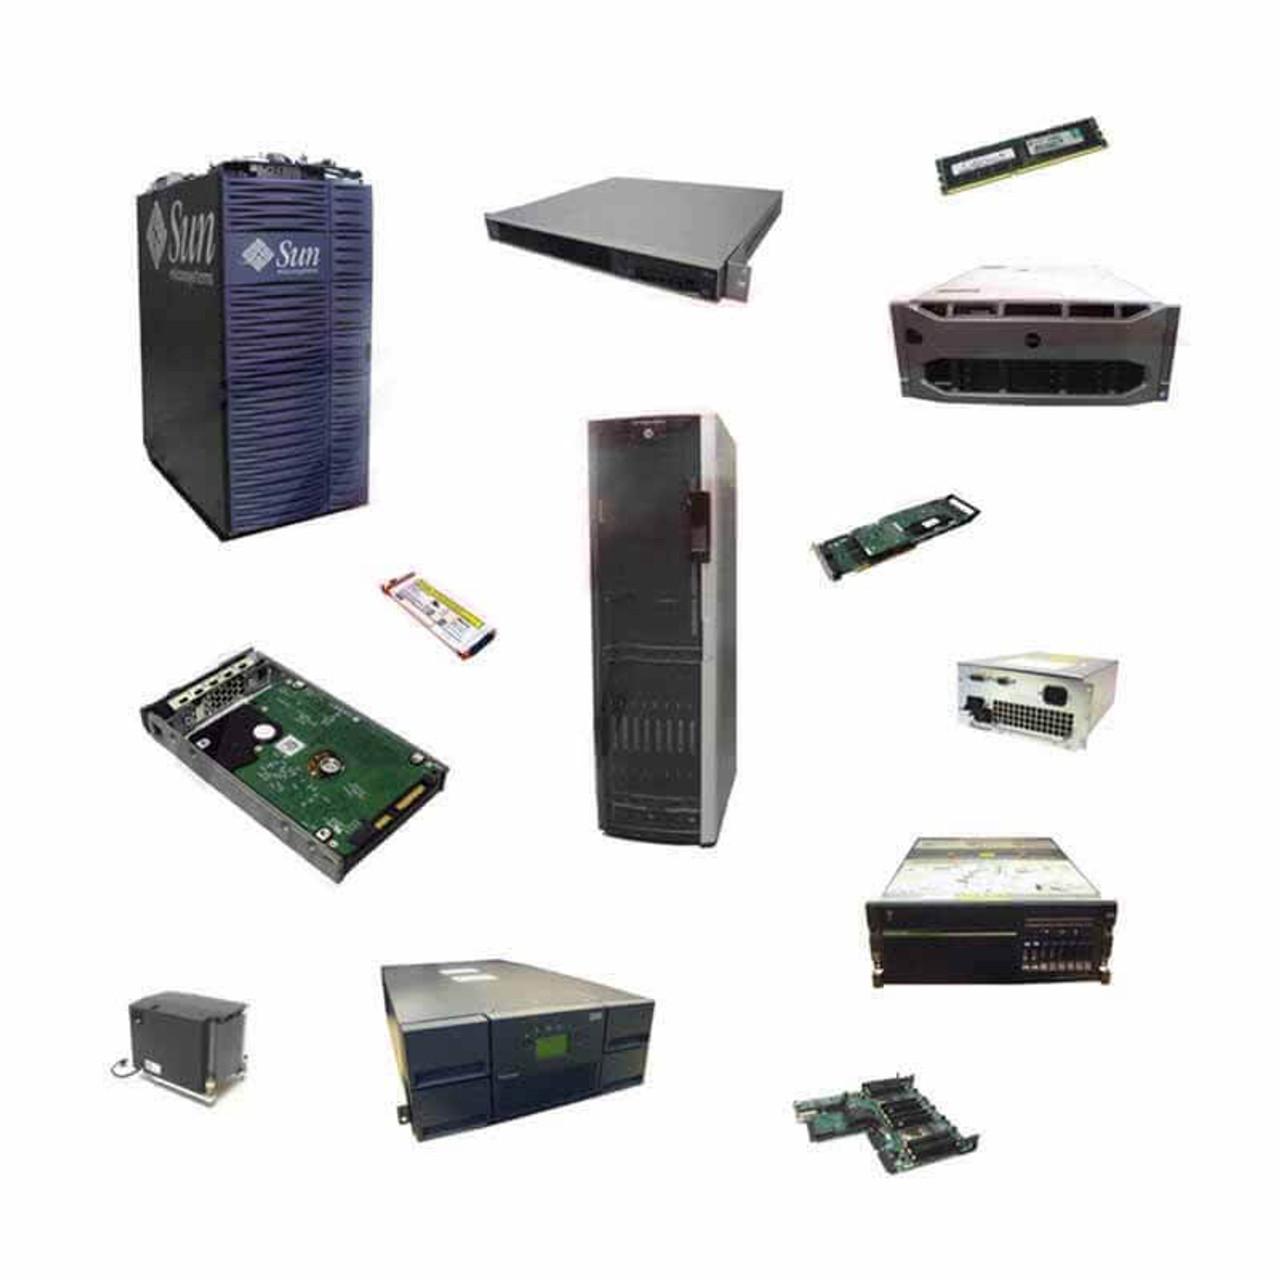 Dell PowerEdge R730 Spare Parts